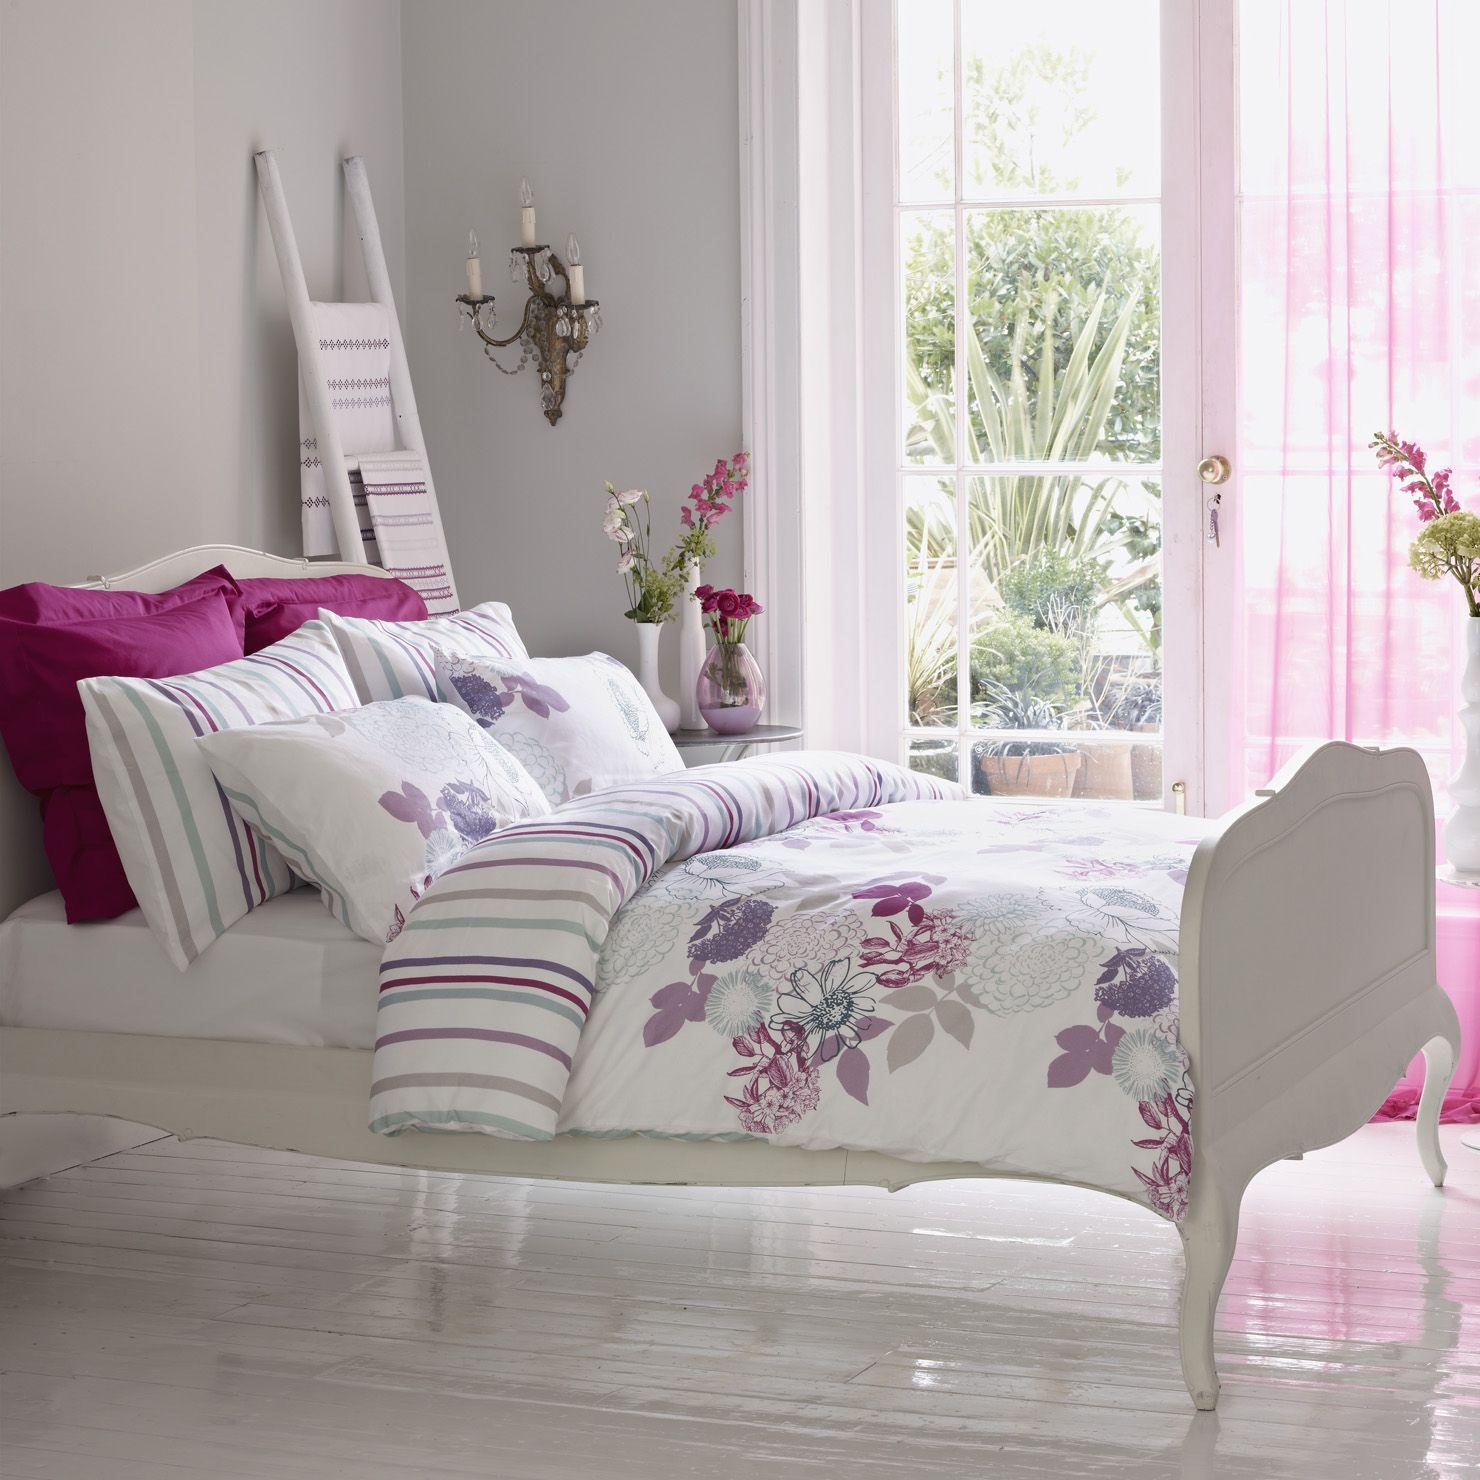 beautiful kingsley bed linen design bedroom decor bedroom decor rh pinterest com au